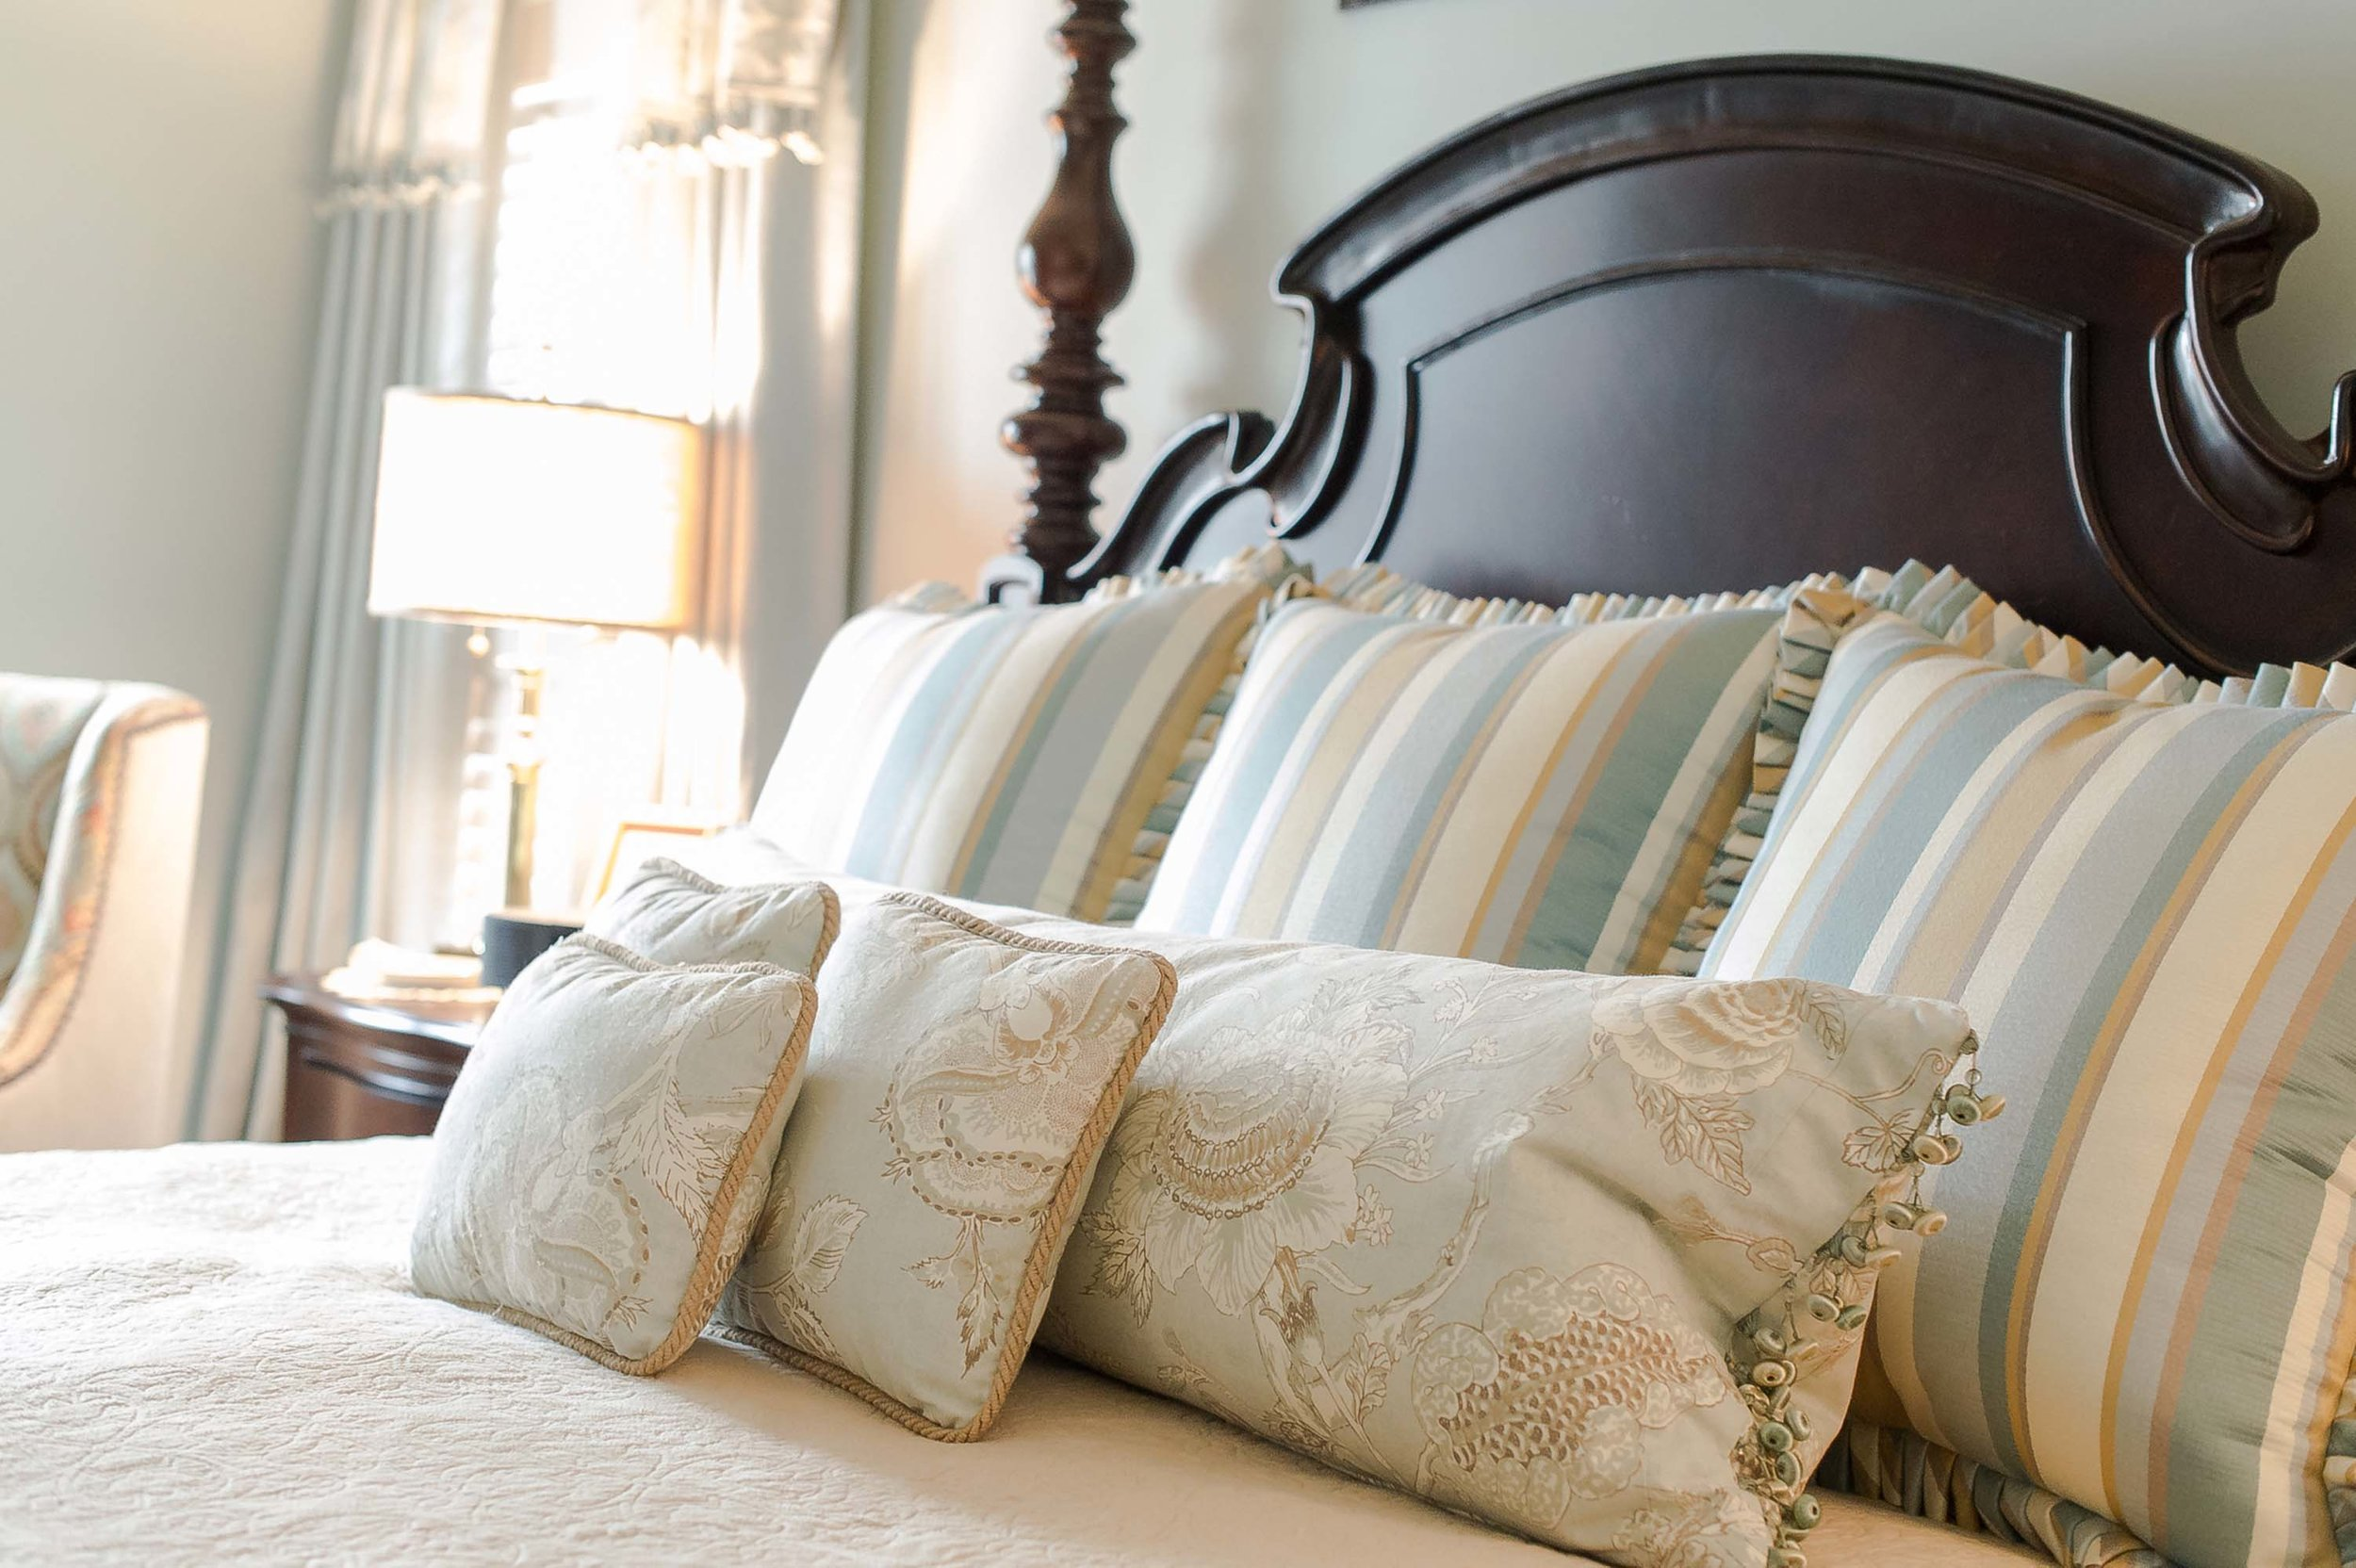 Custom Bedding for Master Bedroom